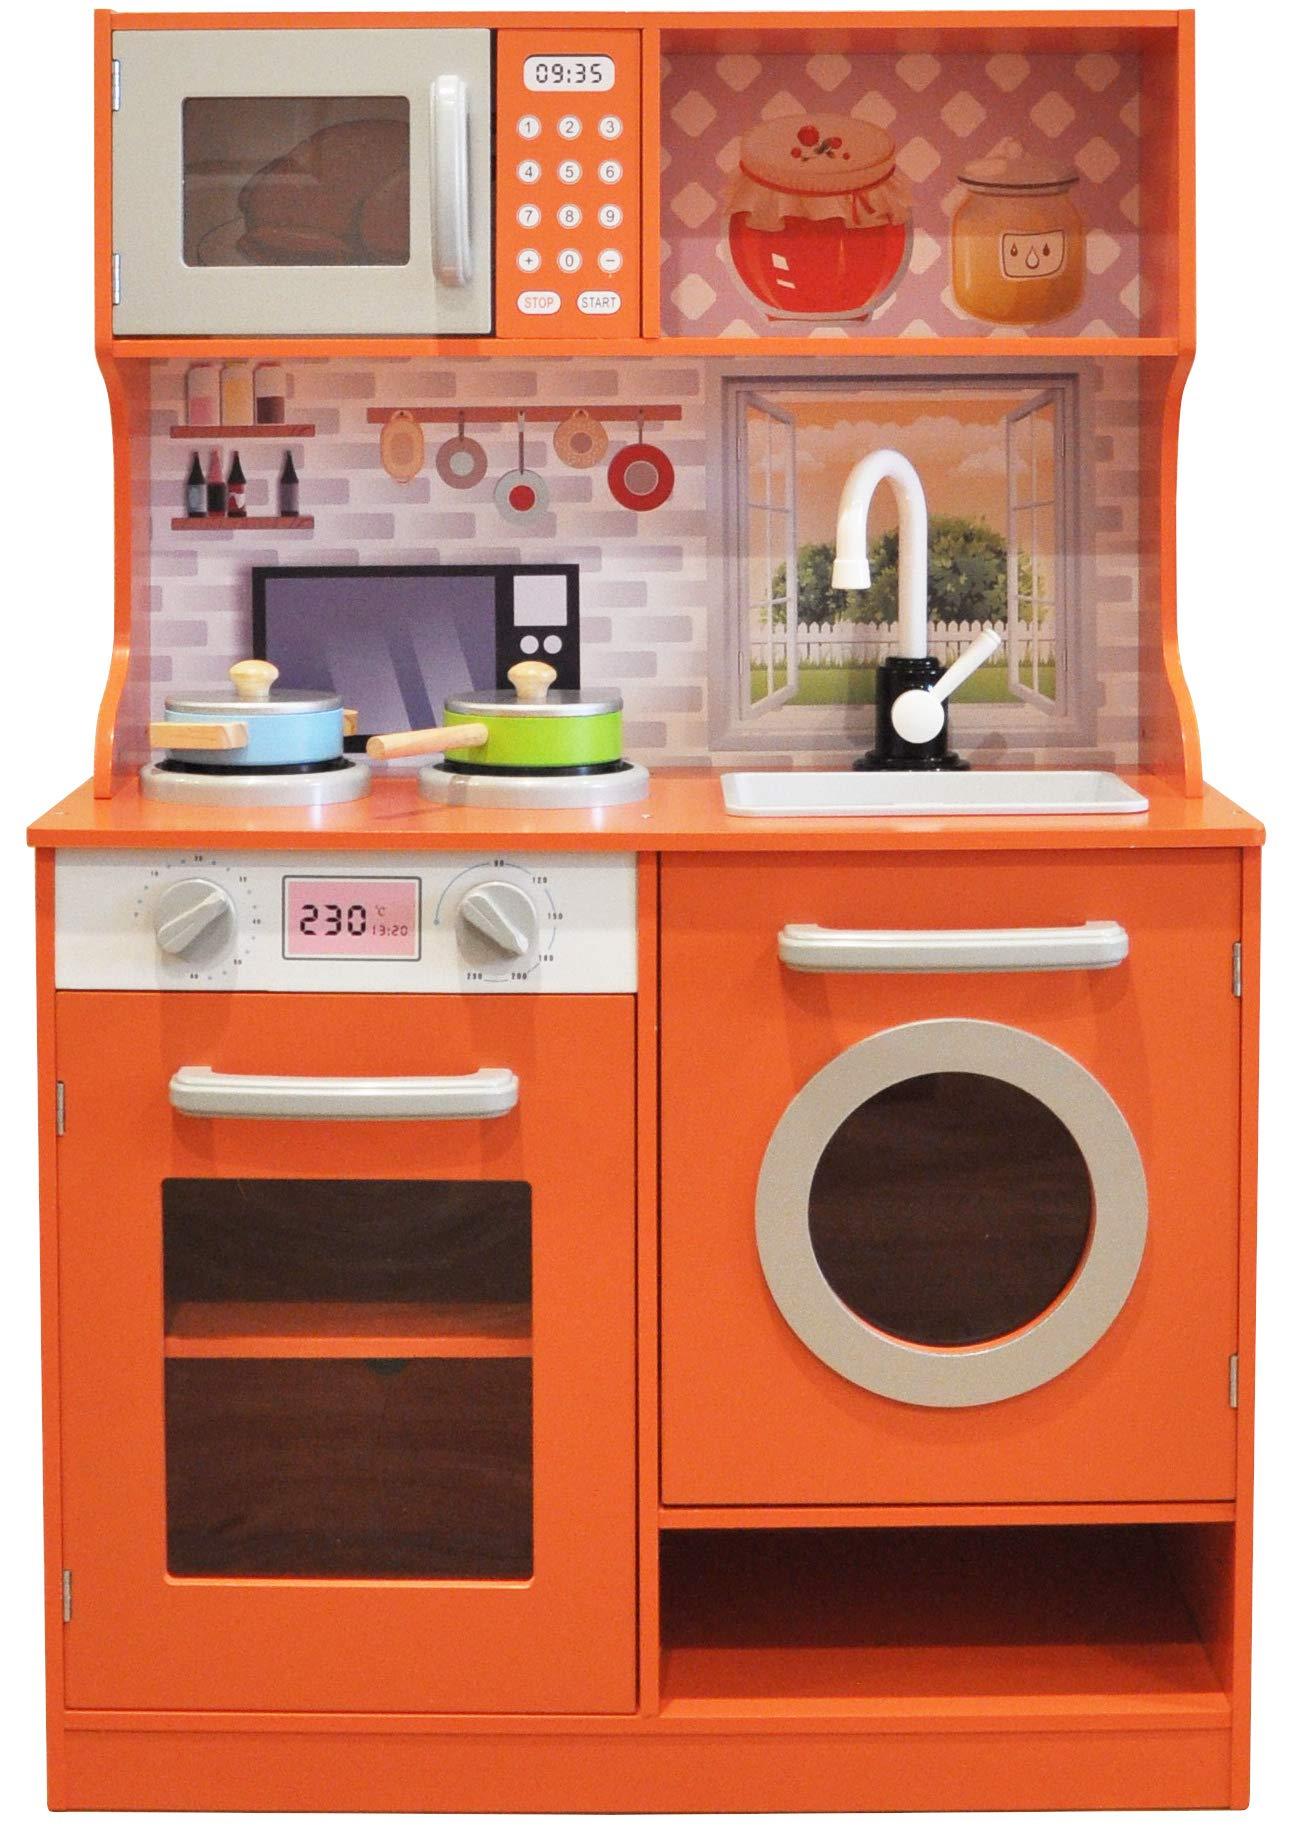 Rainbow Sophia Vibrant Wood Kids Play Kitchen with Cookware Accessories (Orange)